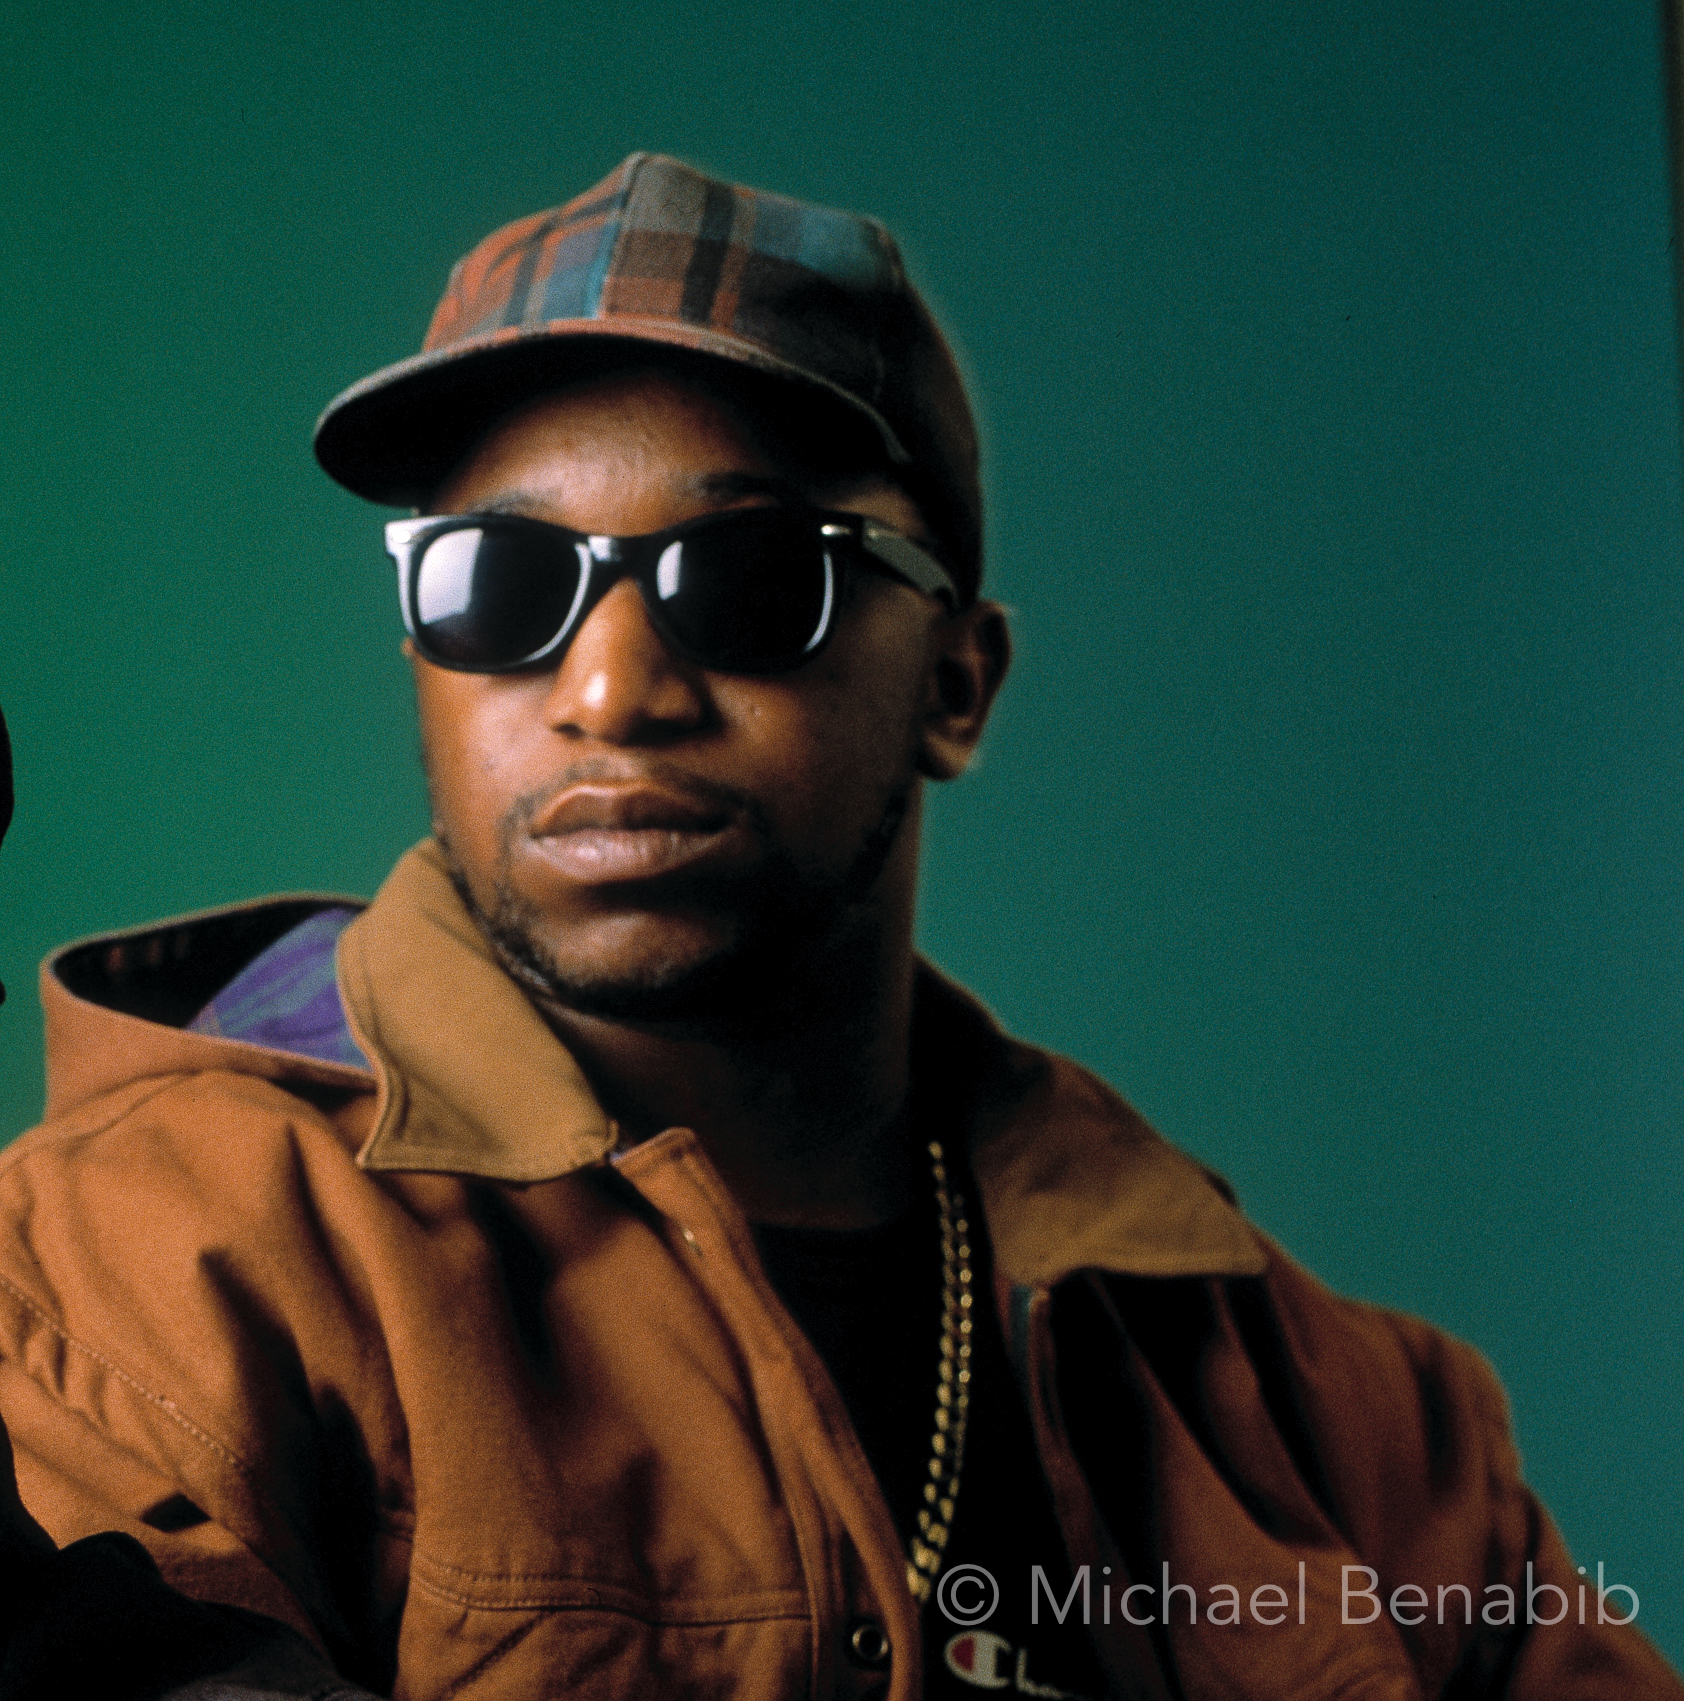 Michael Benabib, Classic Hip Hop Photographer